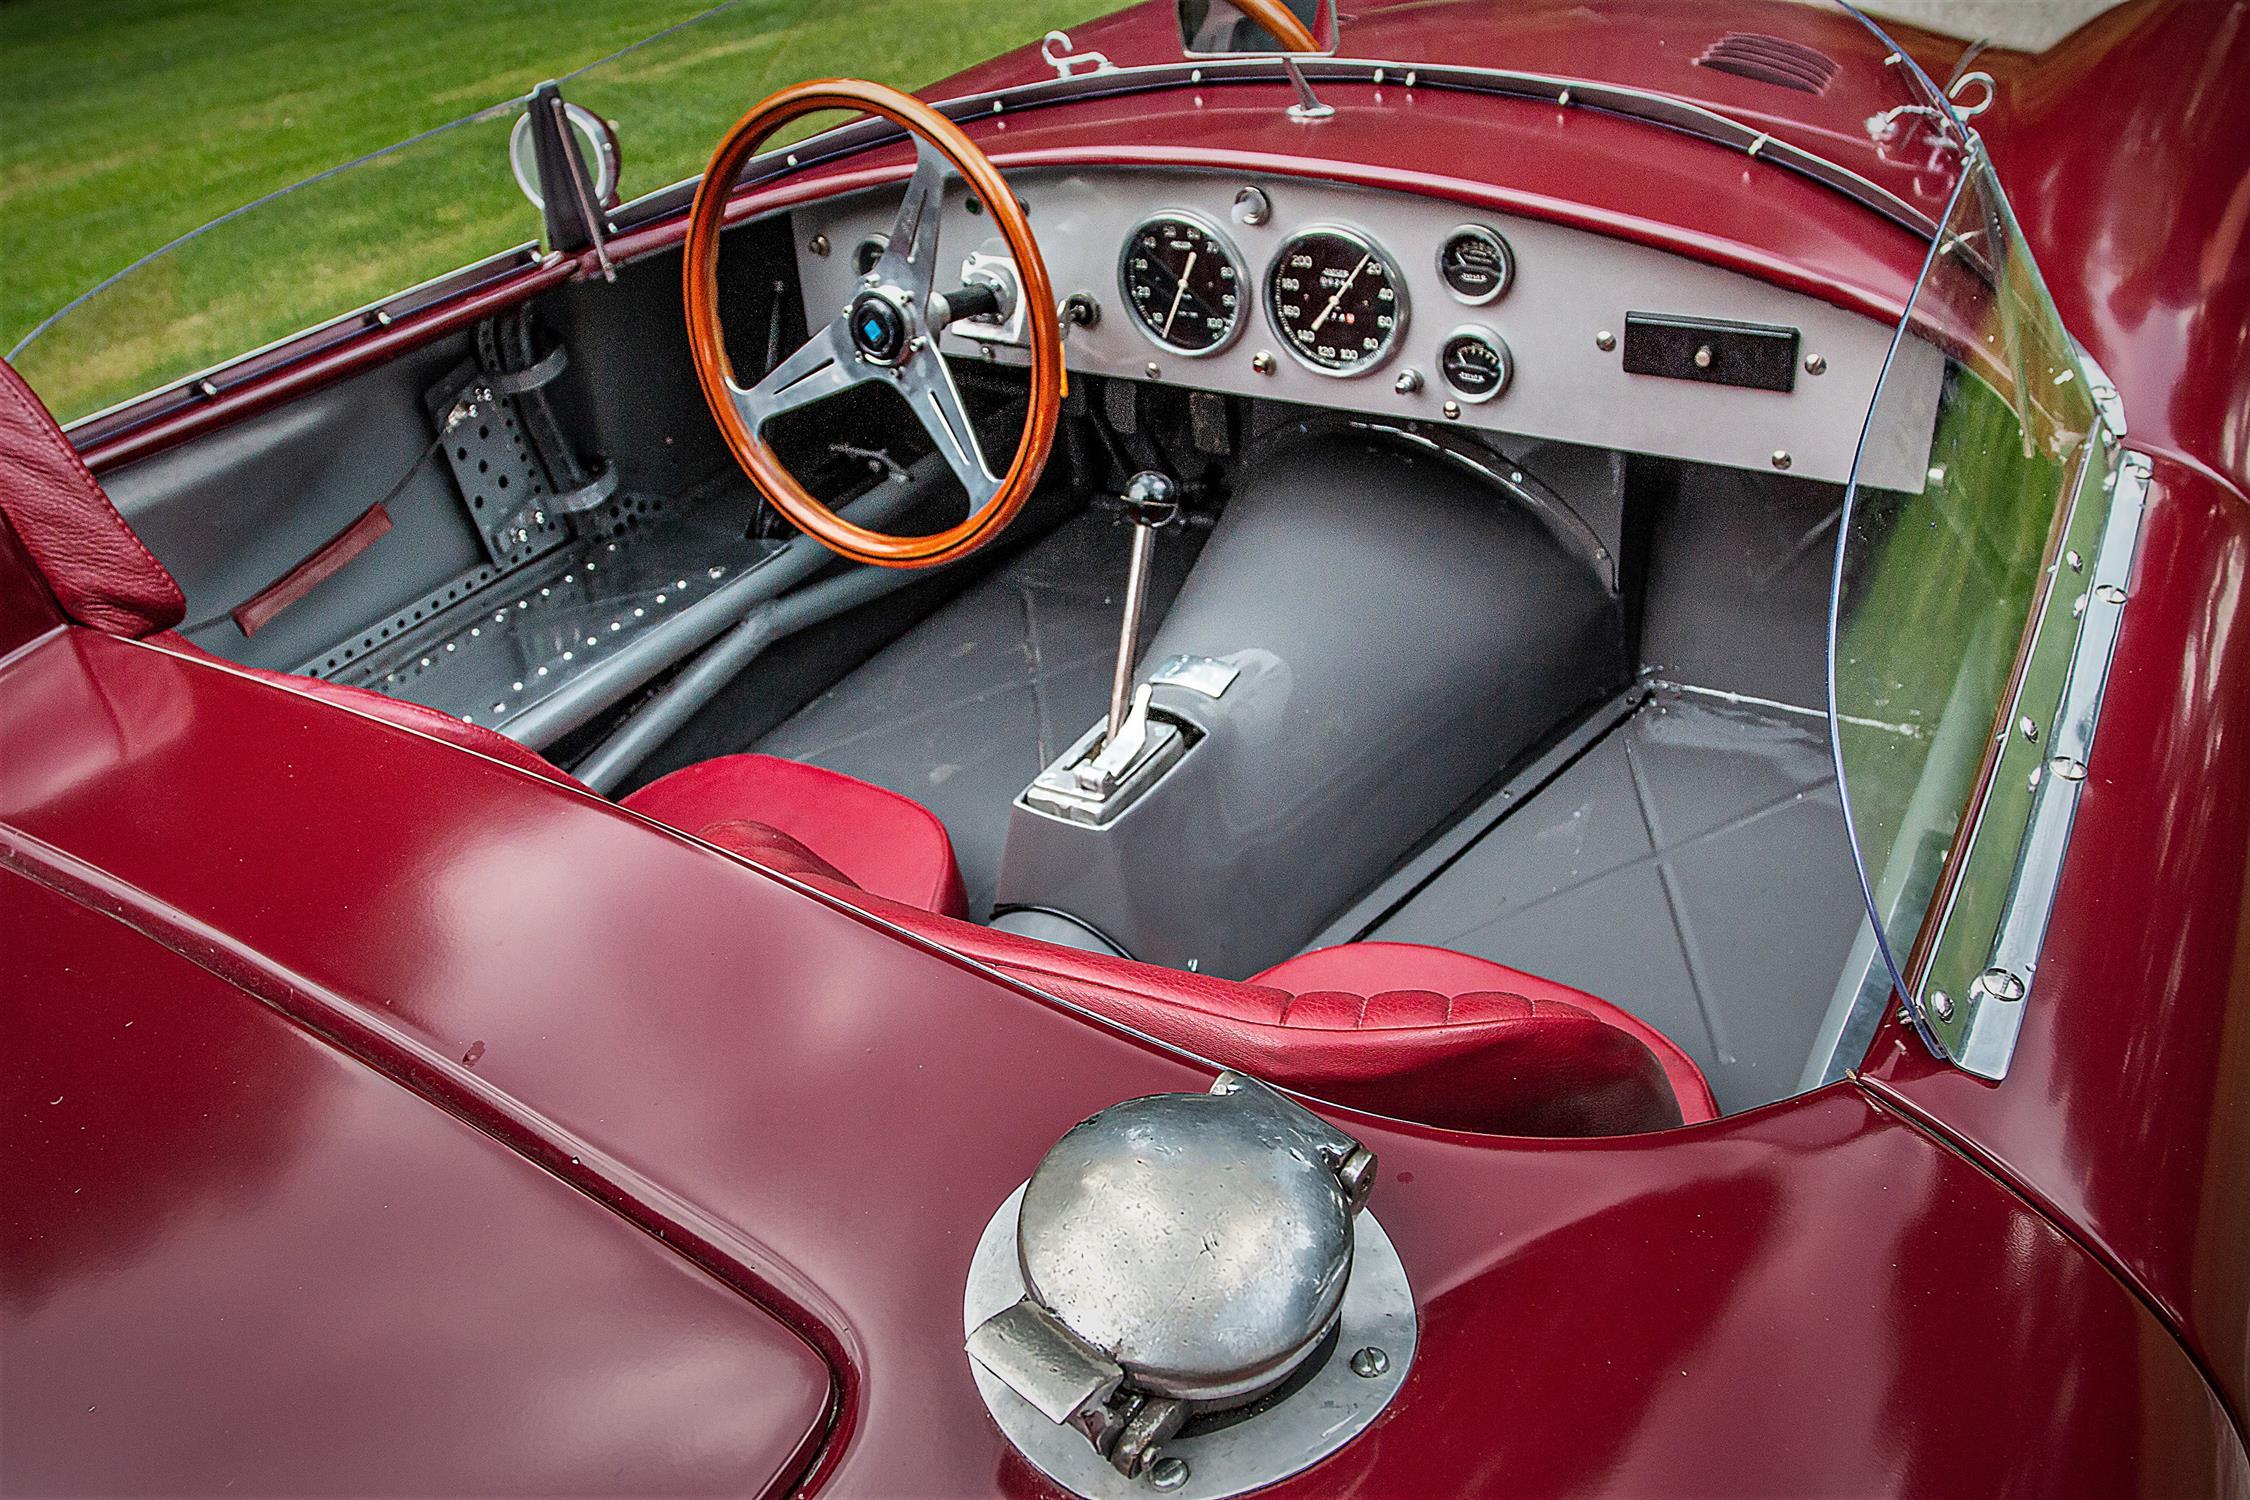 1952 Alfa 1900 ATL Barchetta - Image 2 of 10